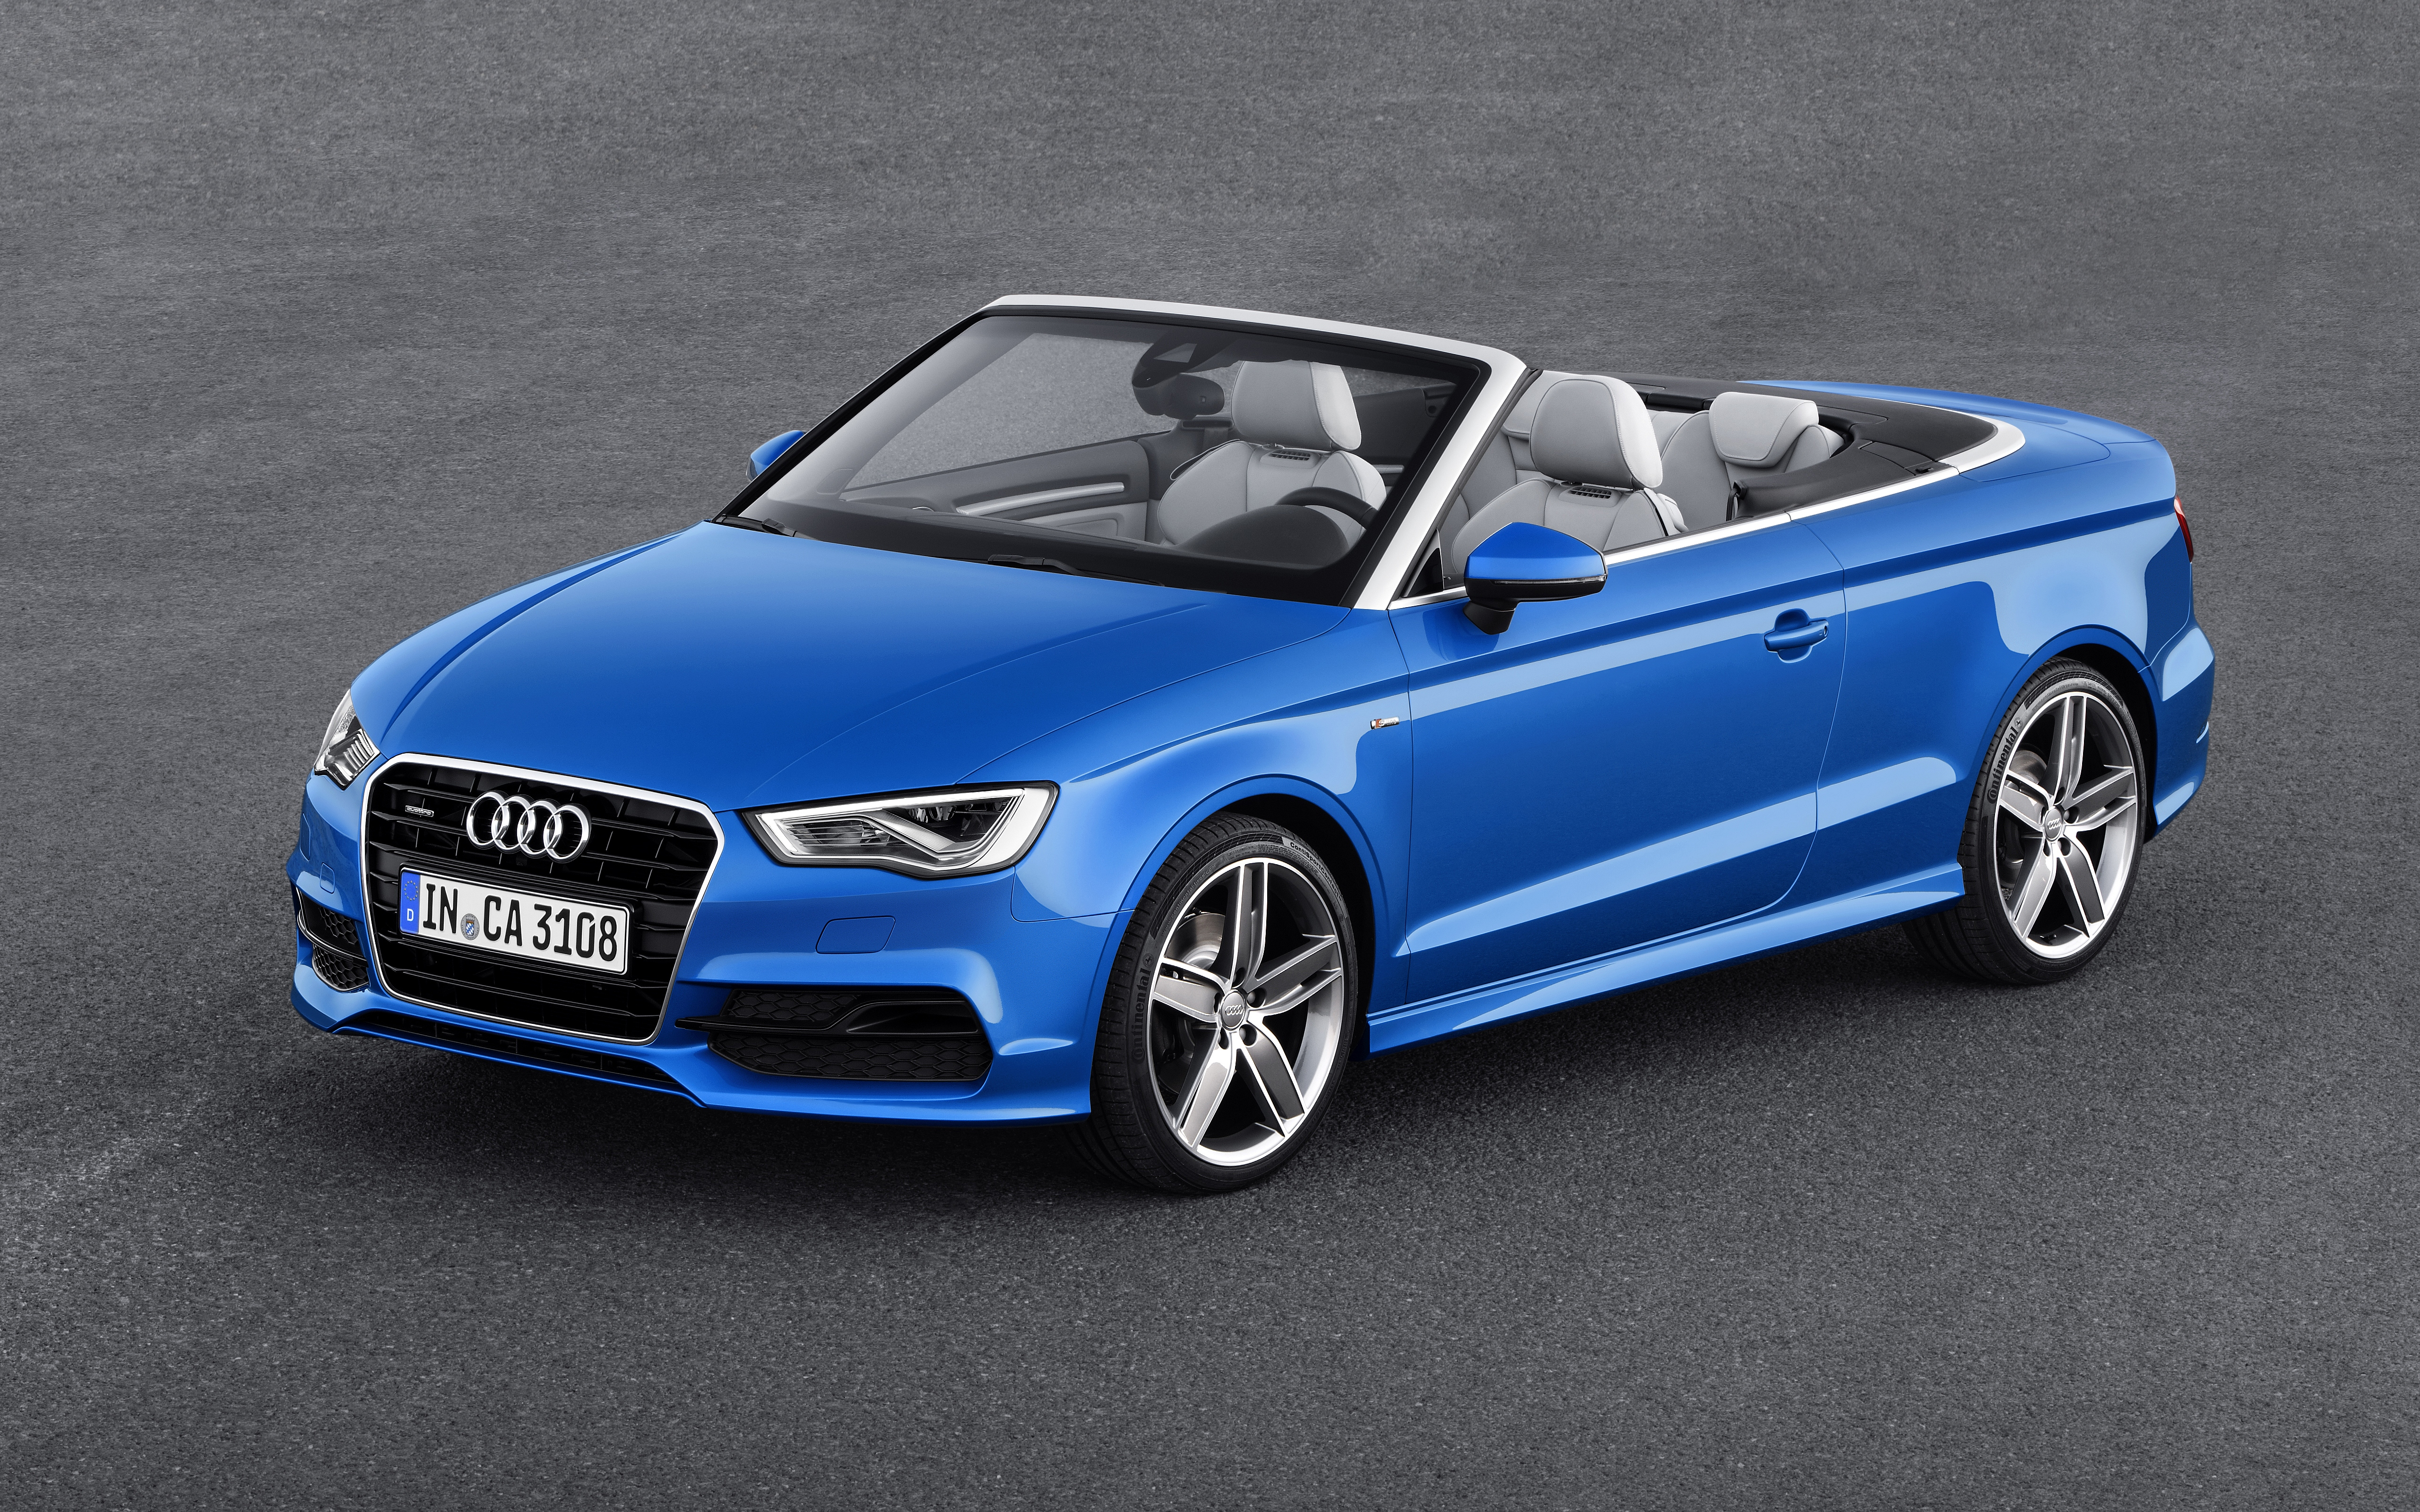 Audi A3 Convertible 2014